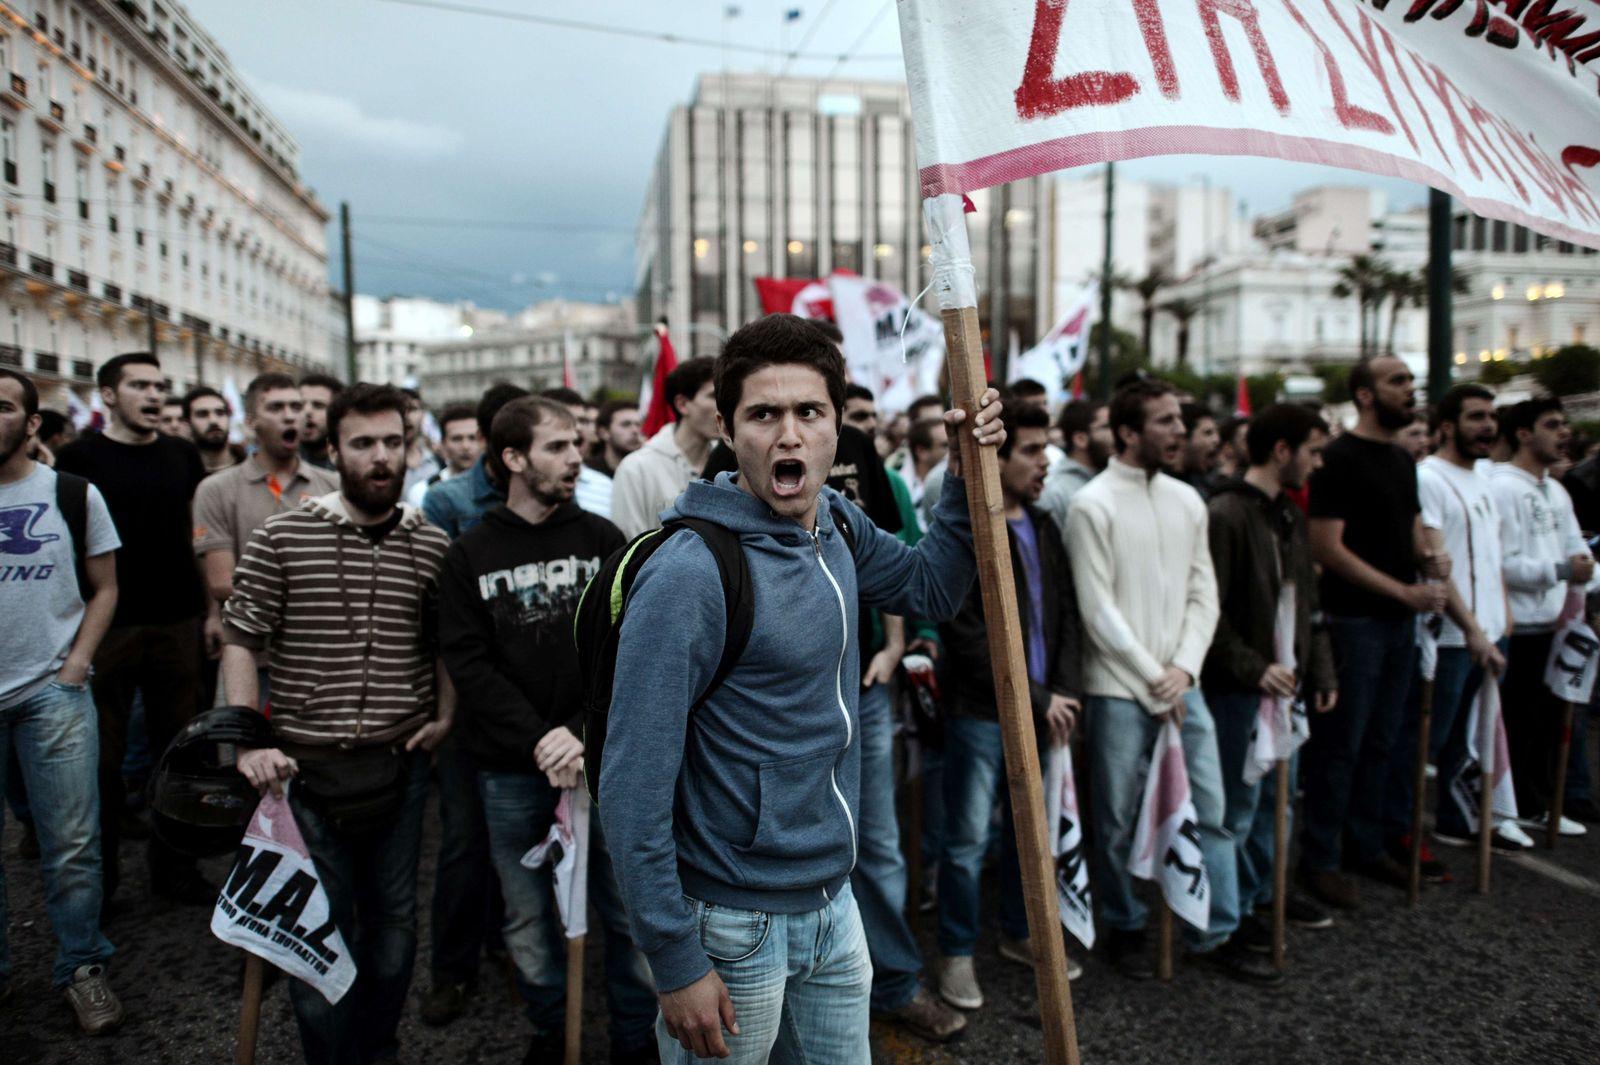 Studentenprotest / Athen